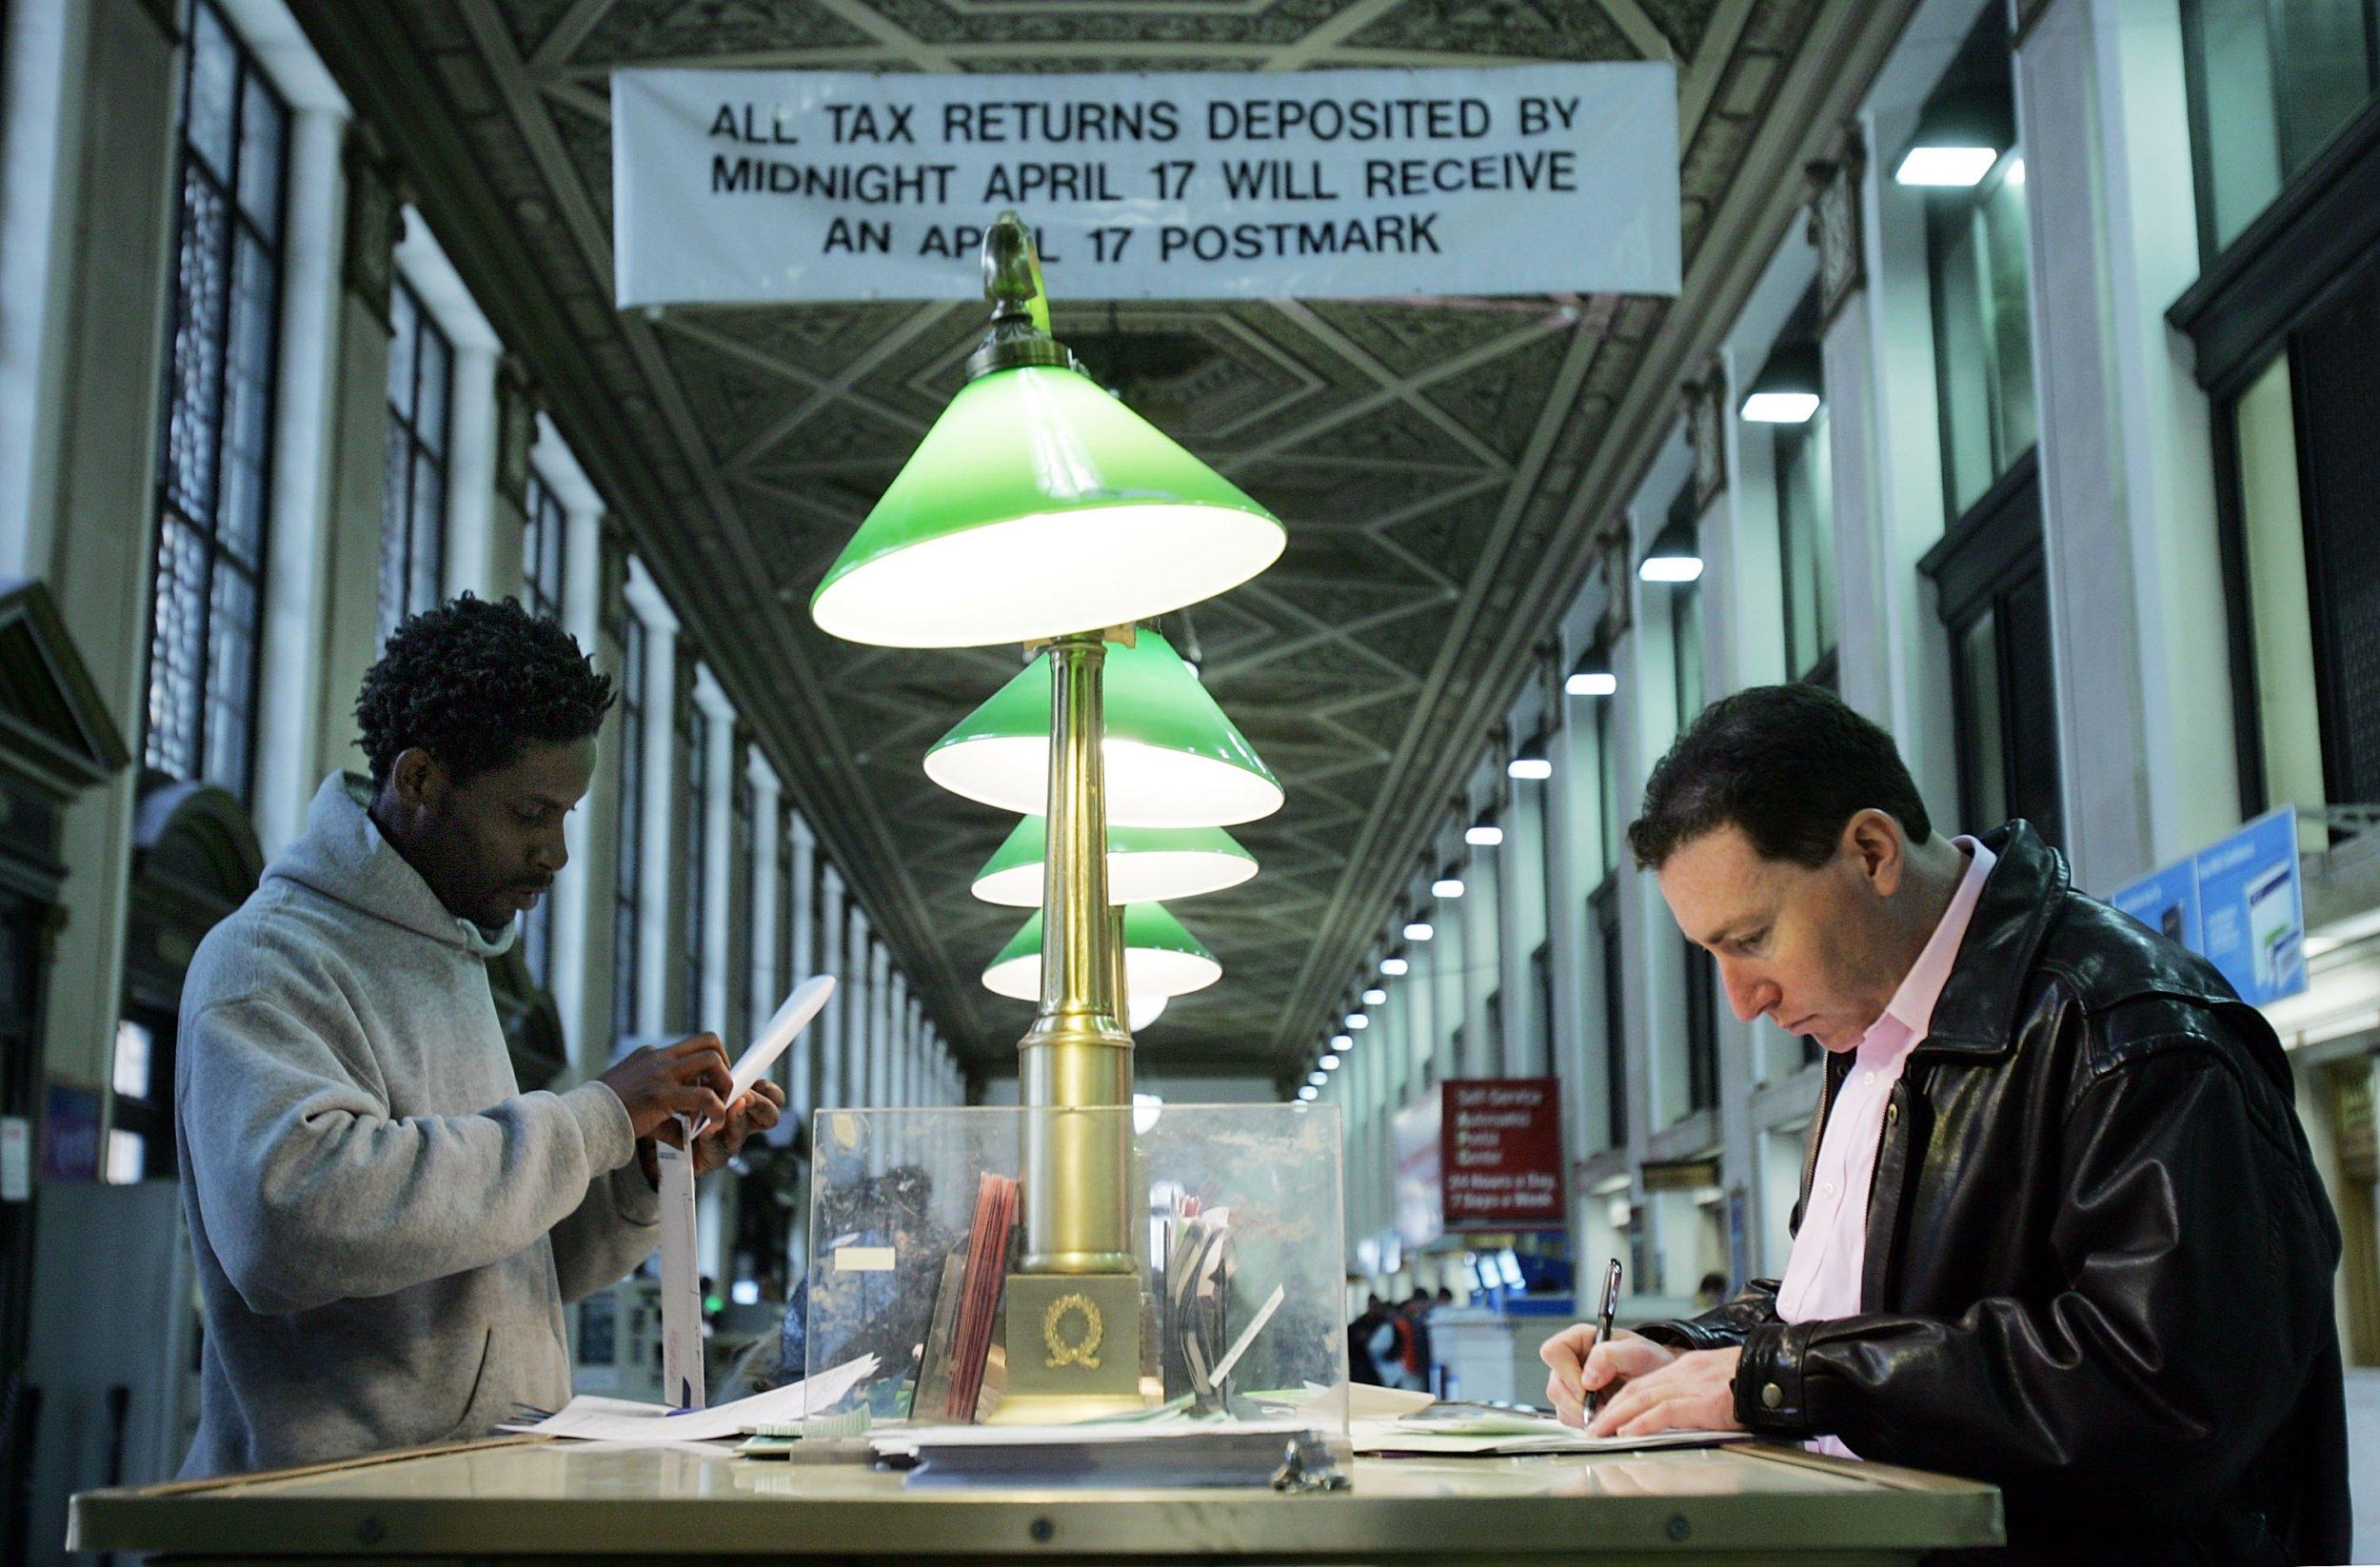 04_17_18_TaxPostOffice